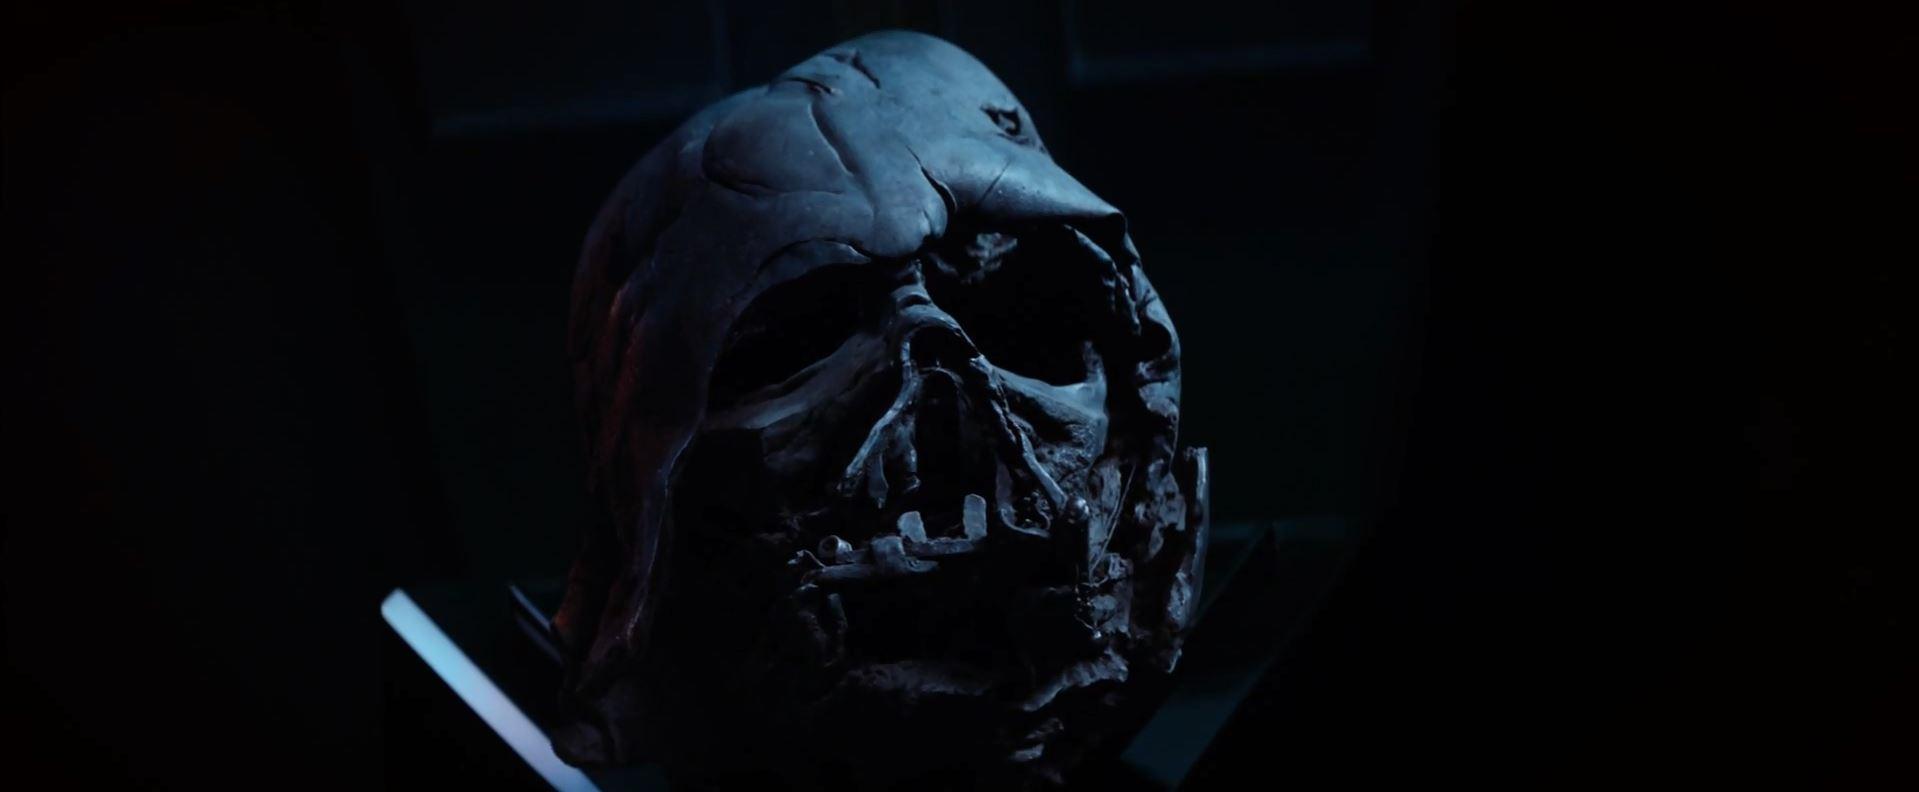 Darth Vader molten helmet. New Star Wars The Force Awakens Trailer Released!